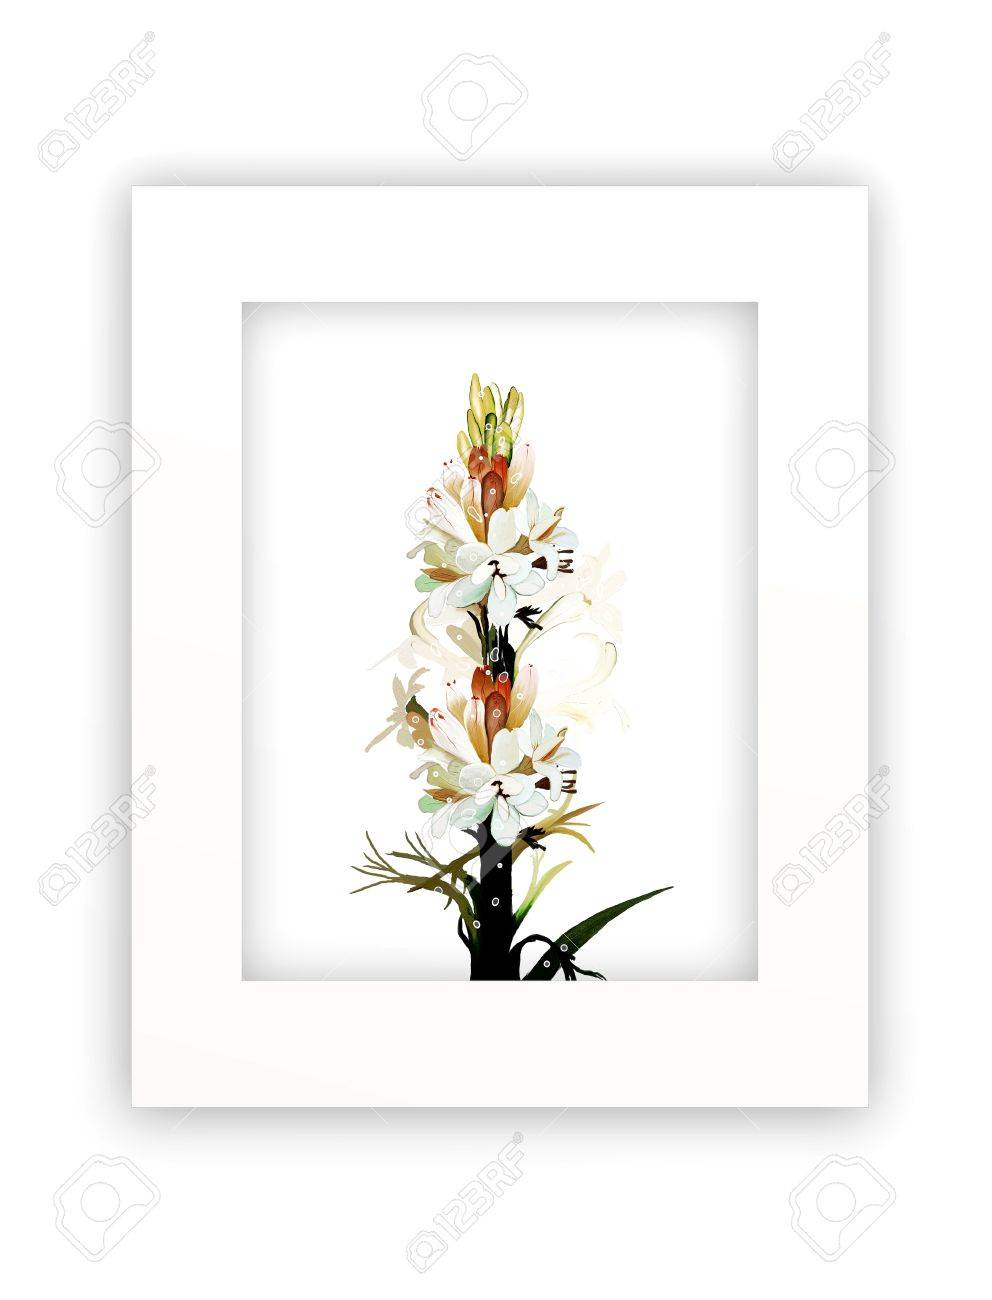 A Beautiful White Tuberose Flowers In A Vertical Frame Islated